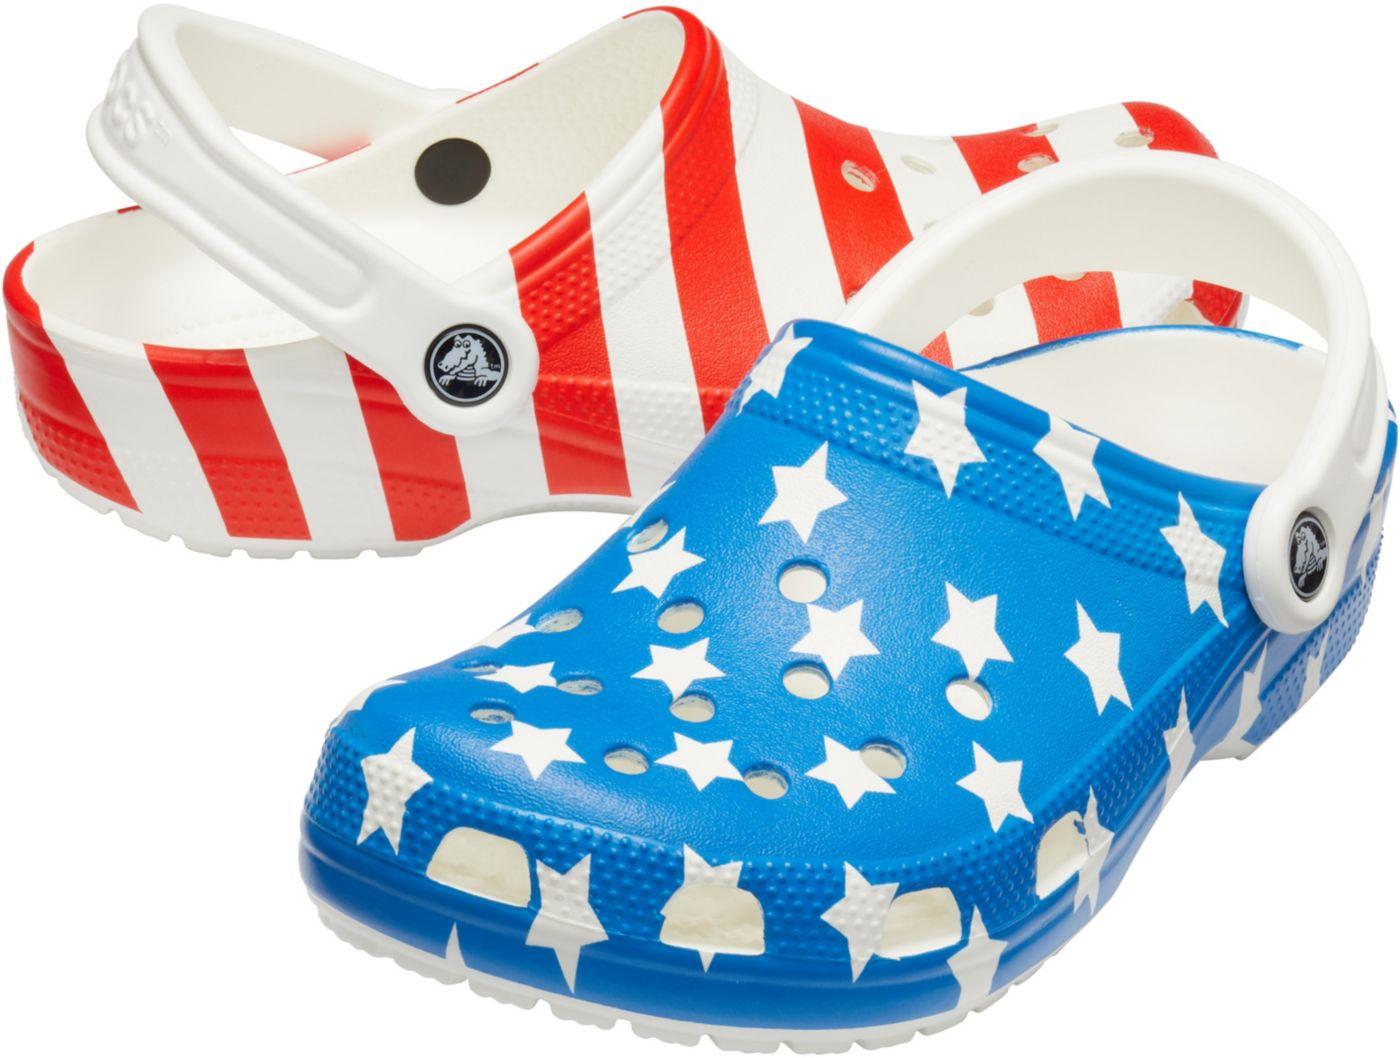 Crocs Adult Classic American Flag Clogs